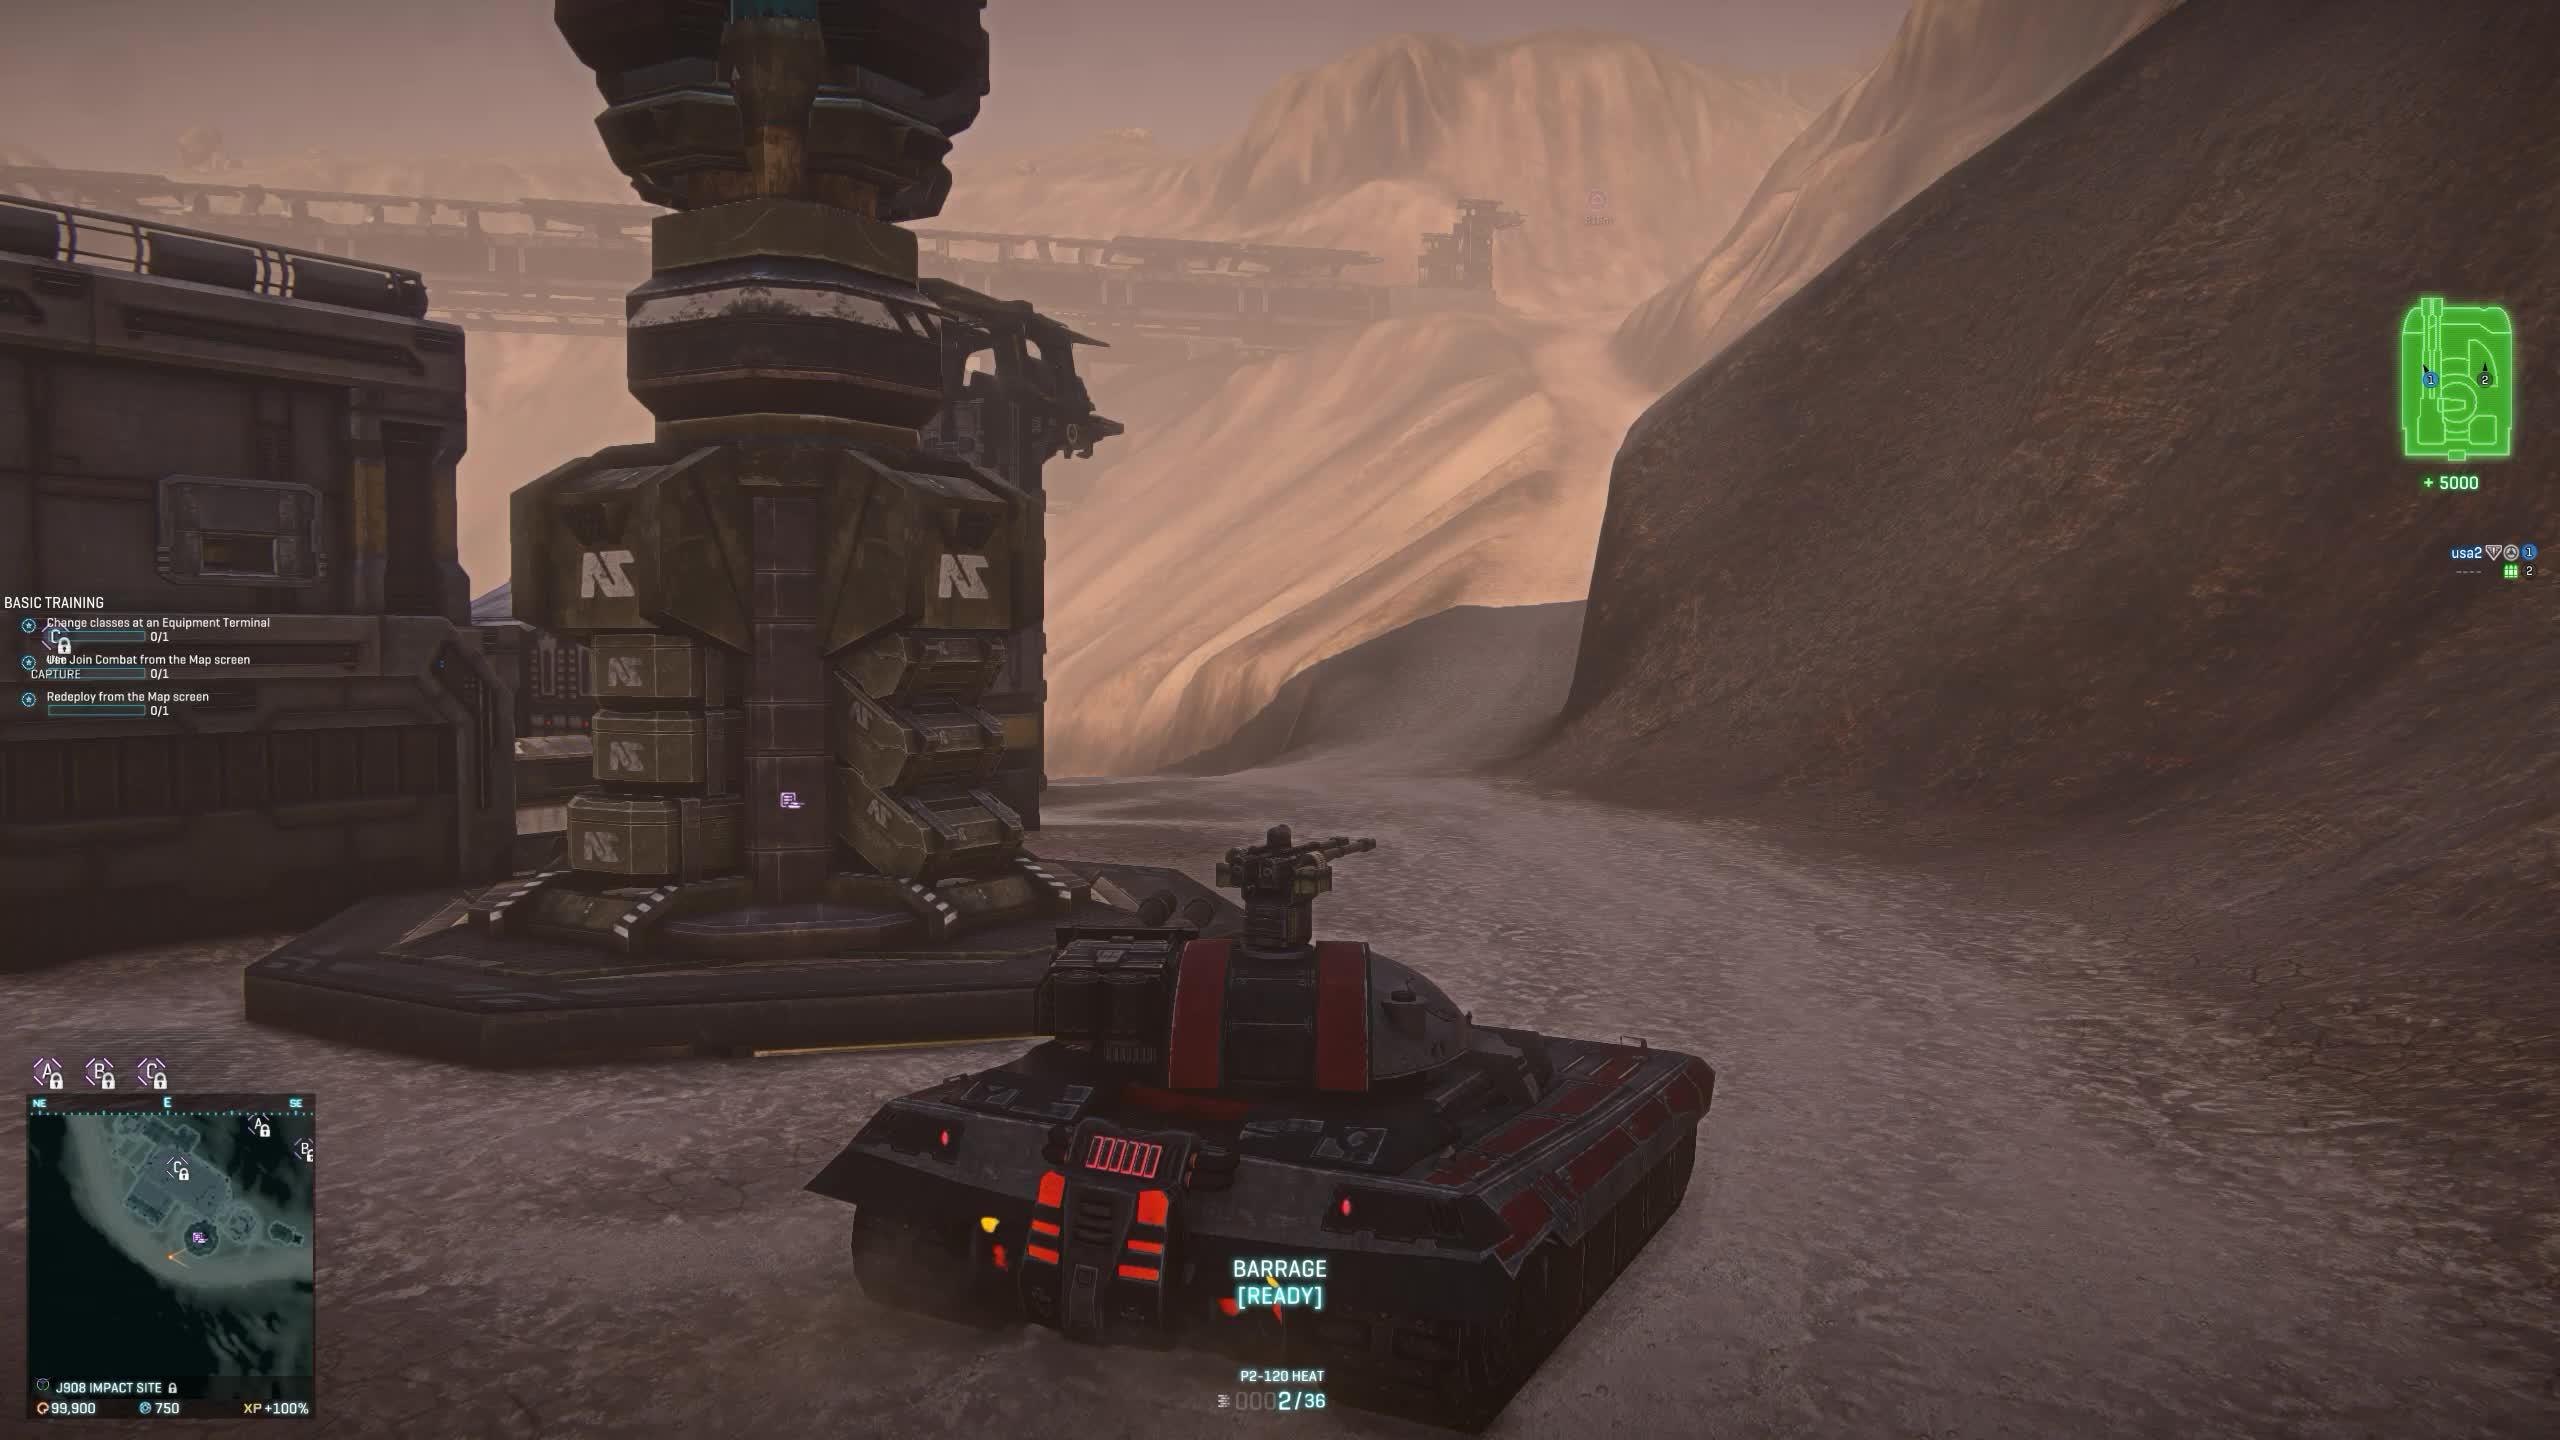 gaming, planetside, planetside2, Prowler Barrage FX GIFs